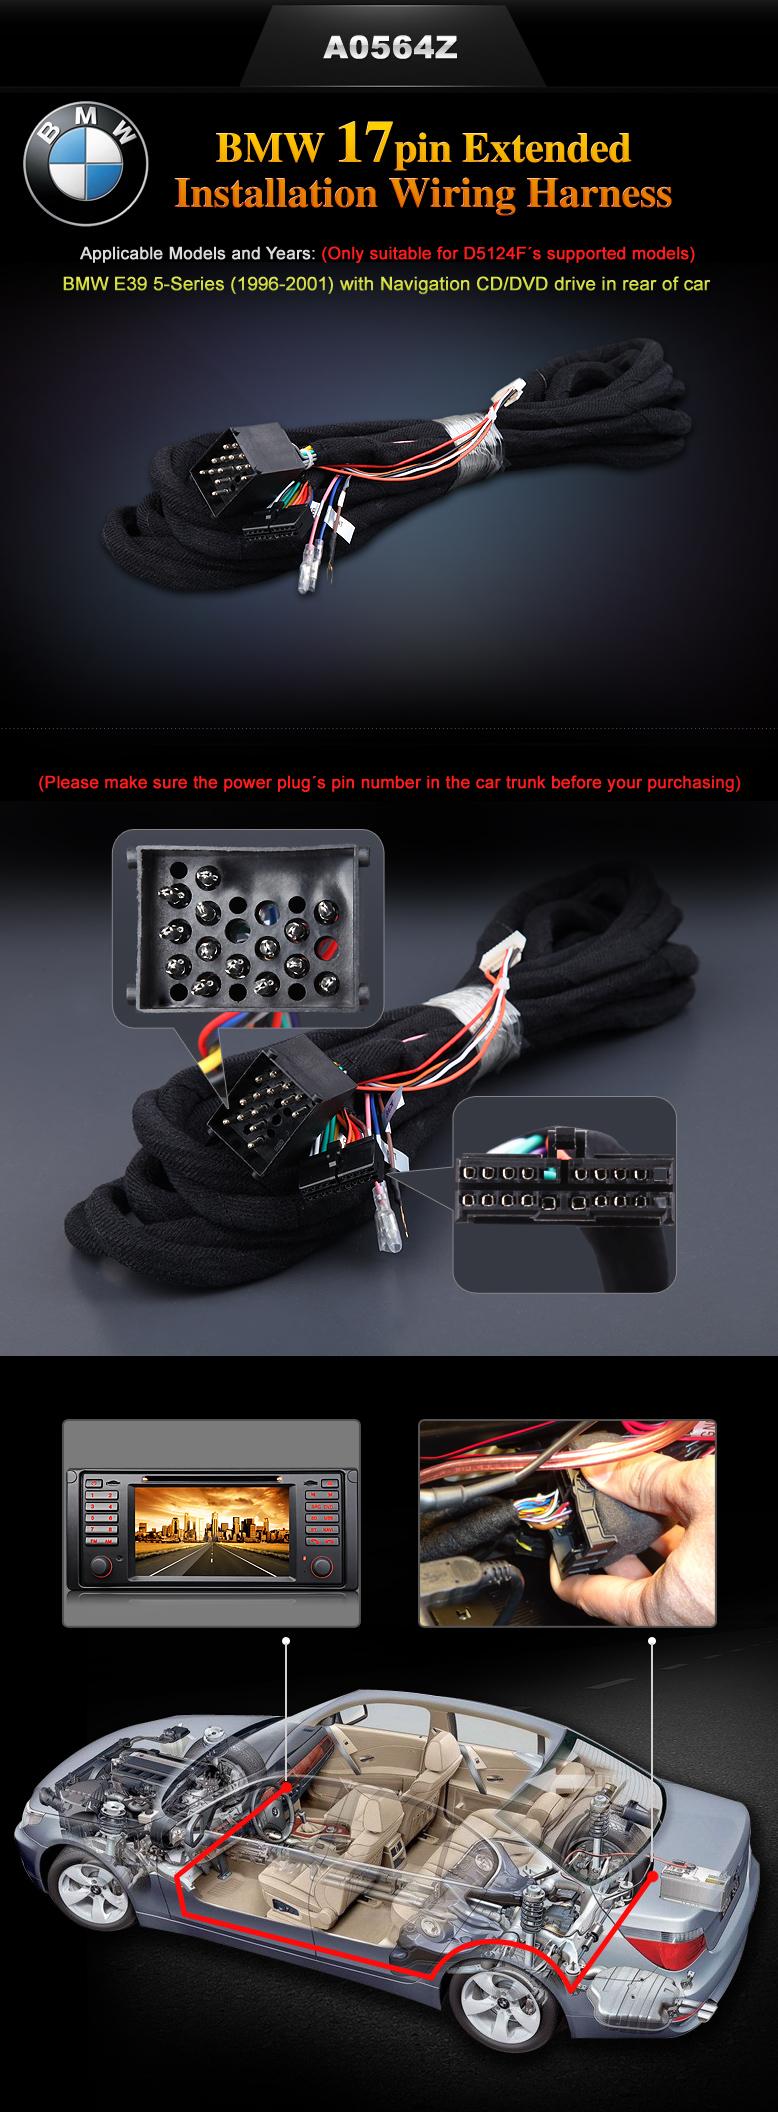 Eonon A0564z Specific Bmw Installation Wiring Harness 5 Series